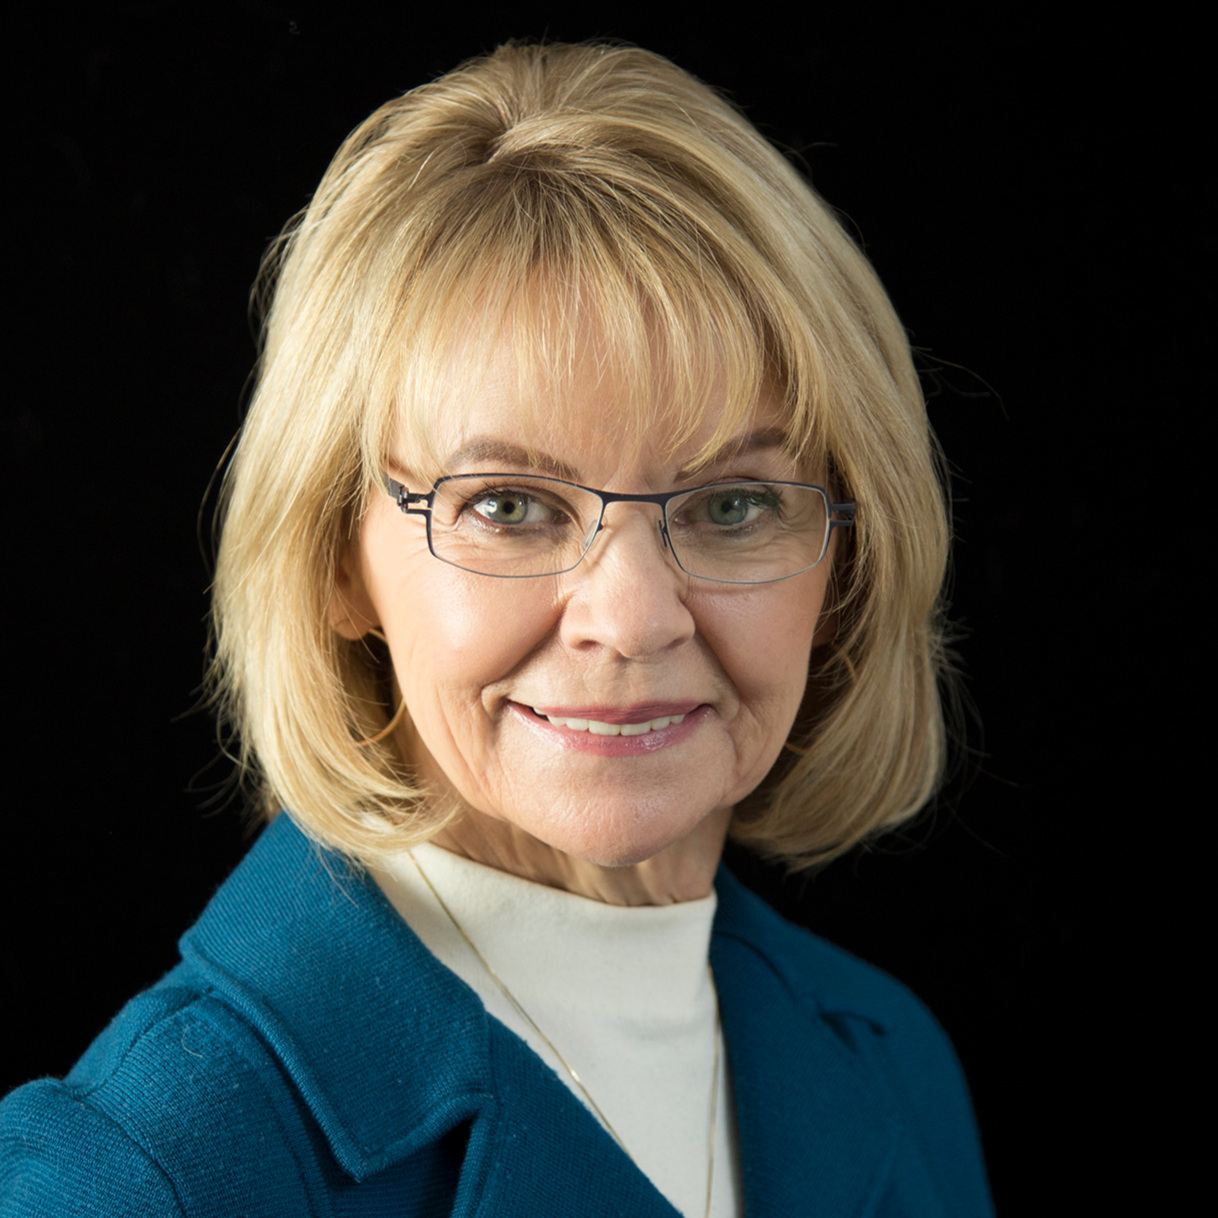 Margaret Jacobson - RE/MAX Newport Elite(262) 496-1212mjacobson@thejacobsongroup.com